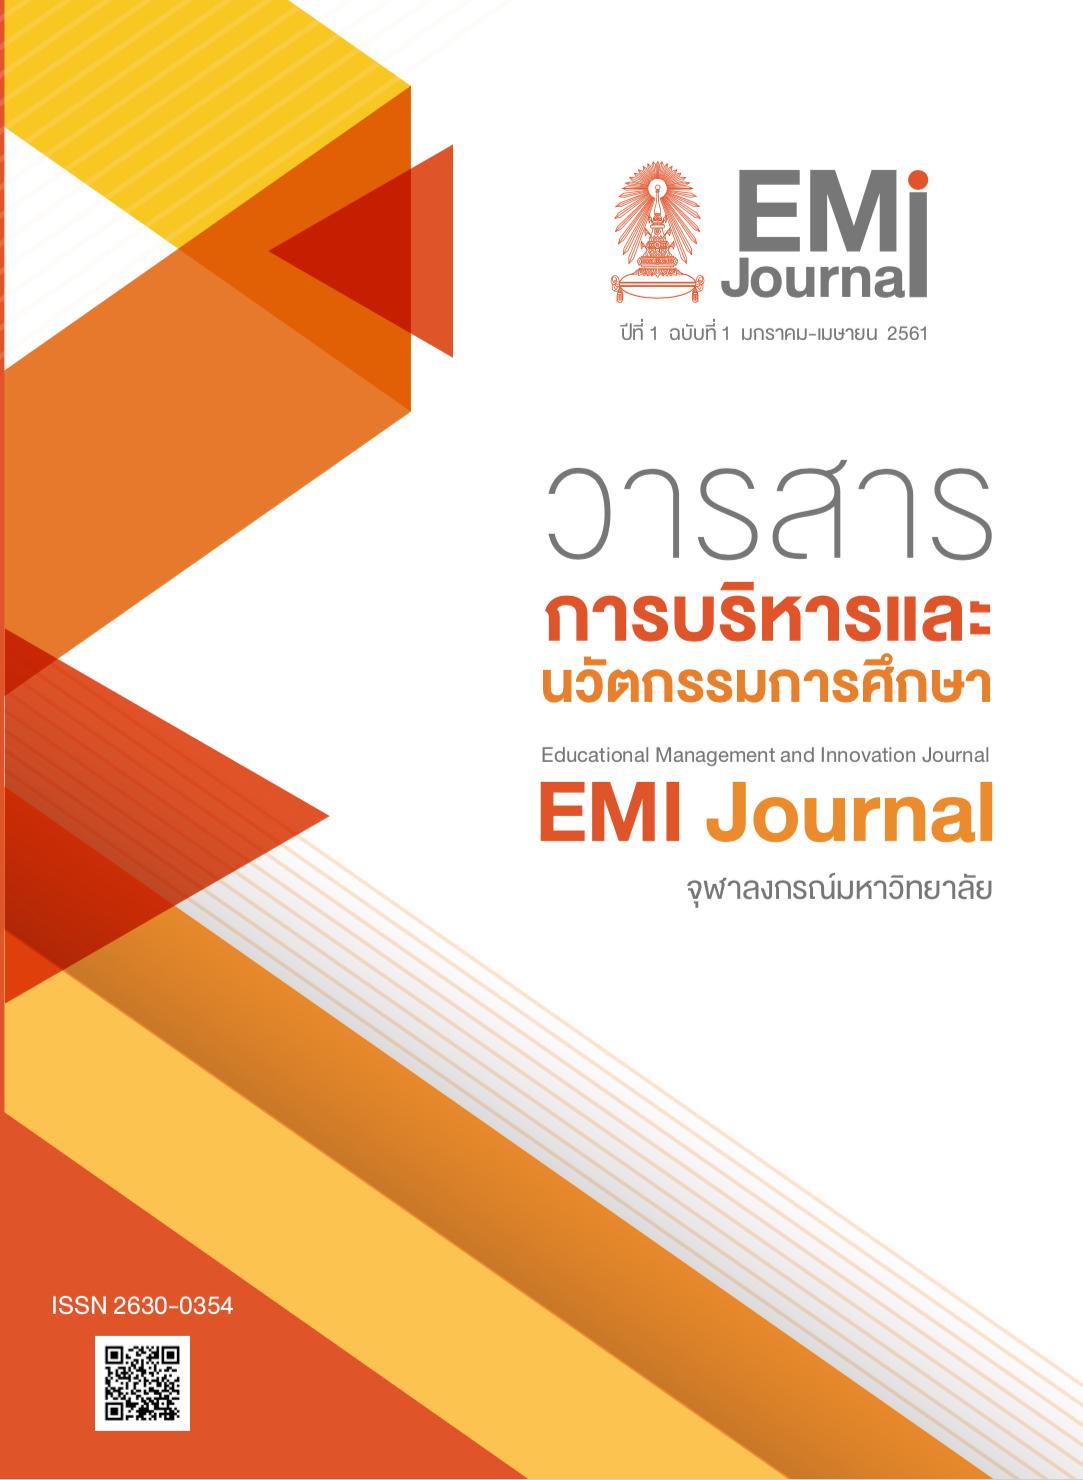 EMI Journal ปีที่ 1 ฉบับที่ 1